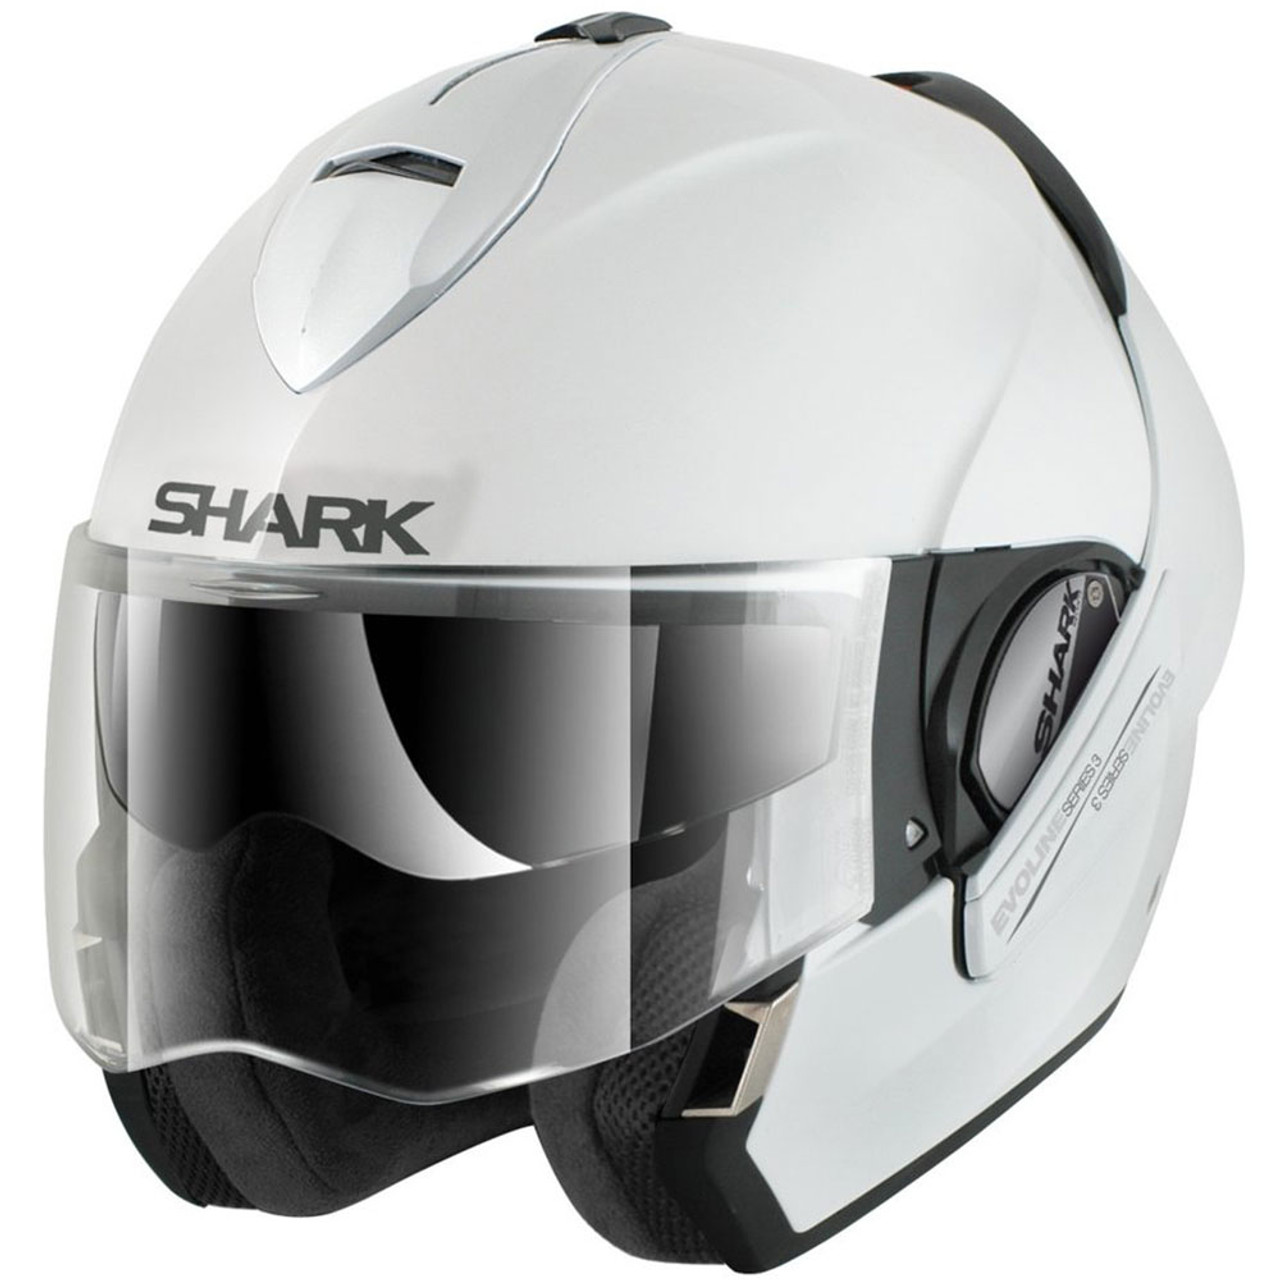 211a1b719ecd5f Shark Evoline 3 Gloss White Modular Helmet - HE9350DWHUM - Get ...